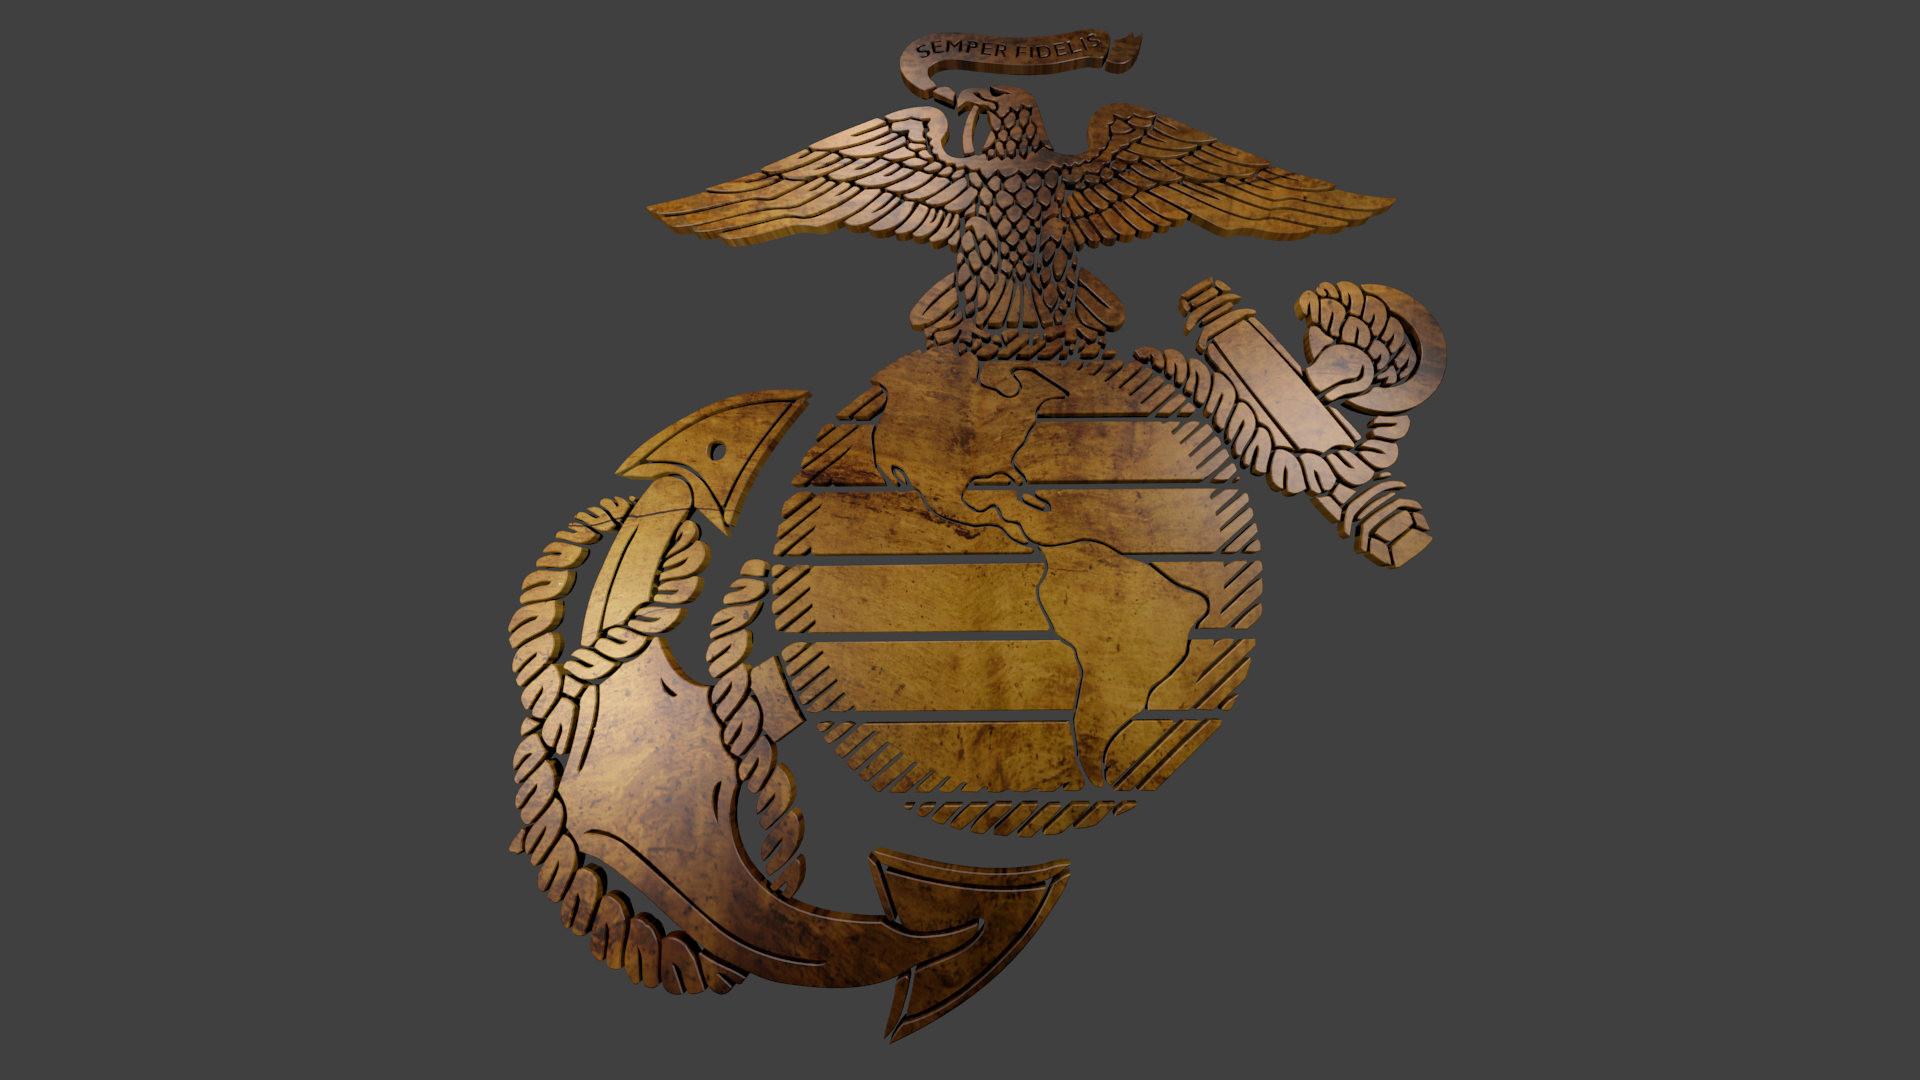 Marines USMC military r wallpaper | | 46655 | WallpaperUP